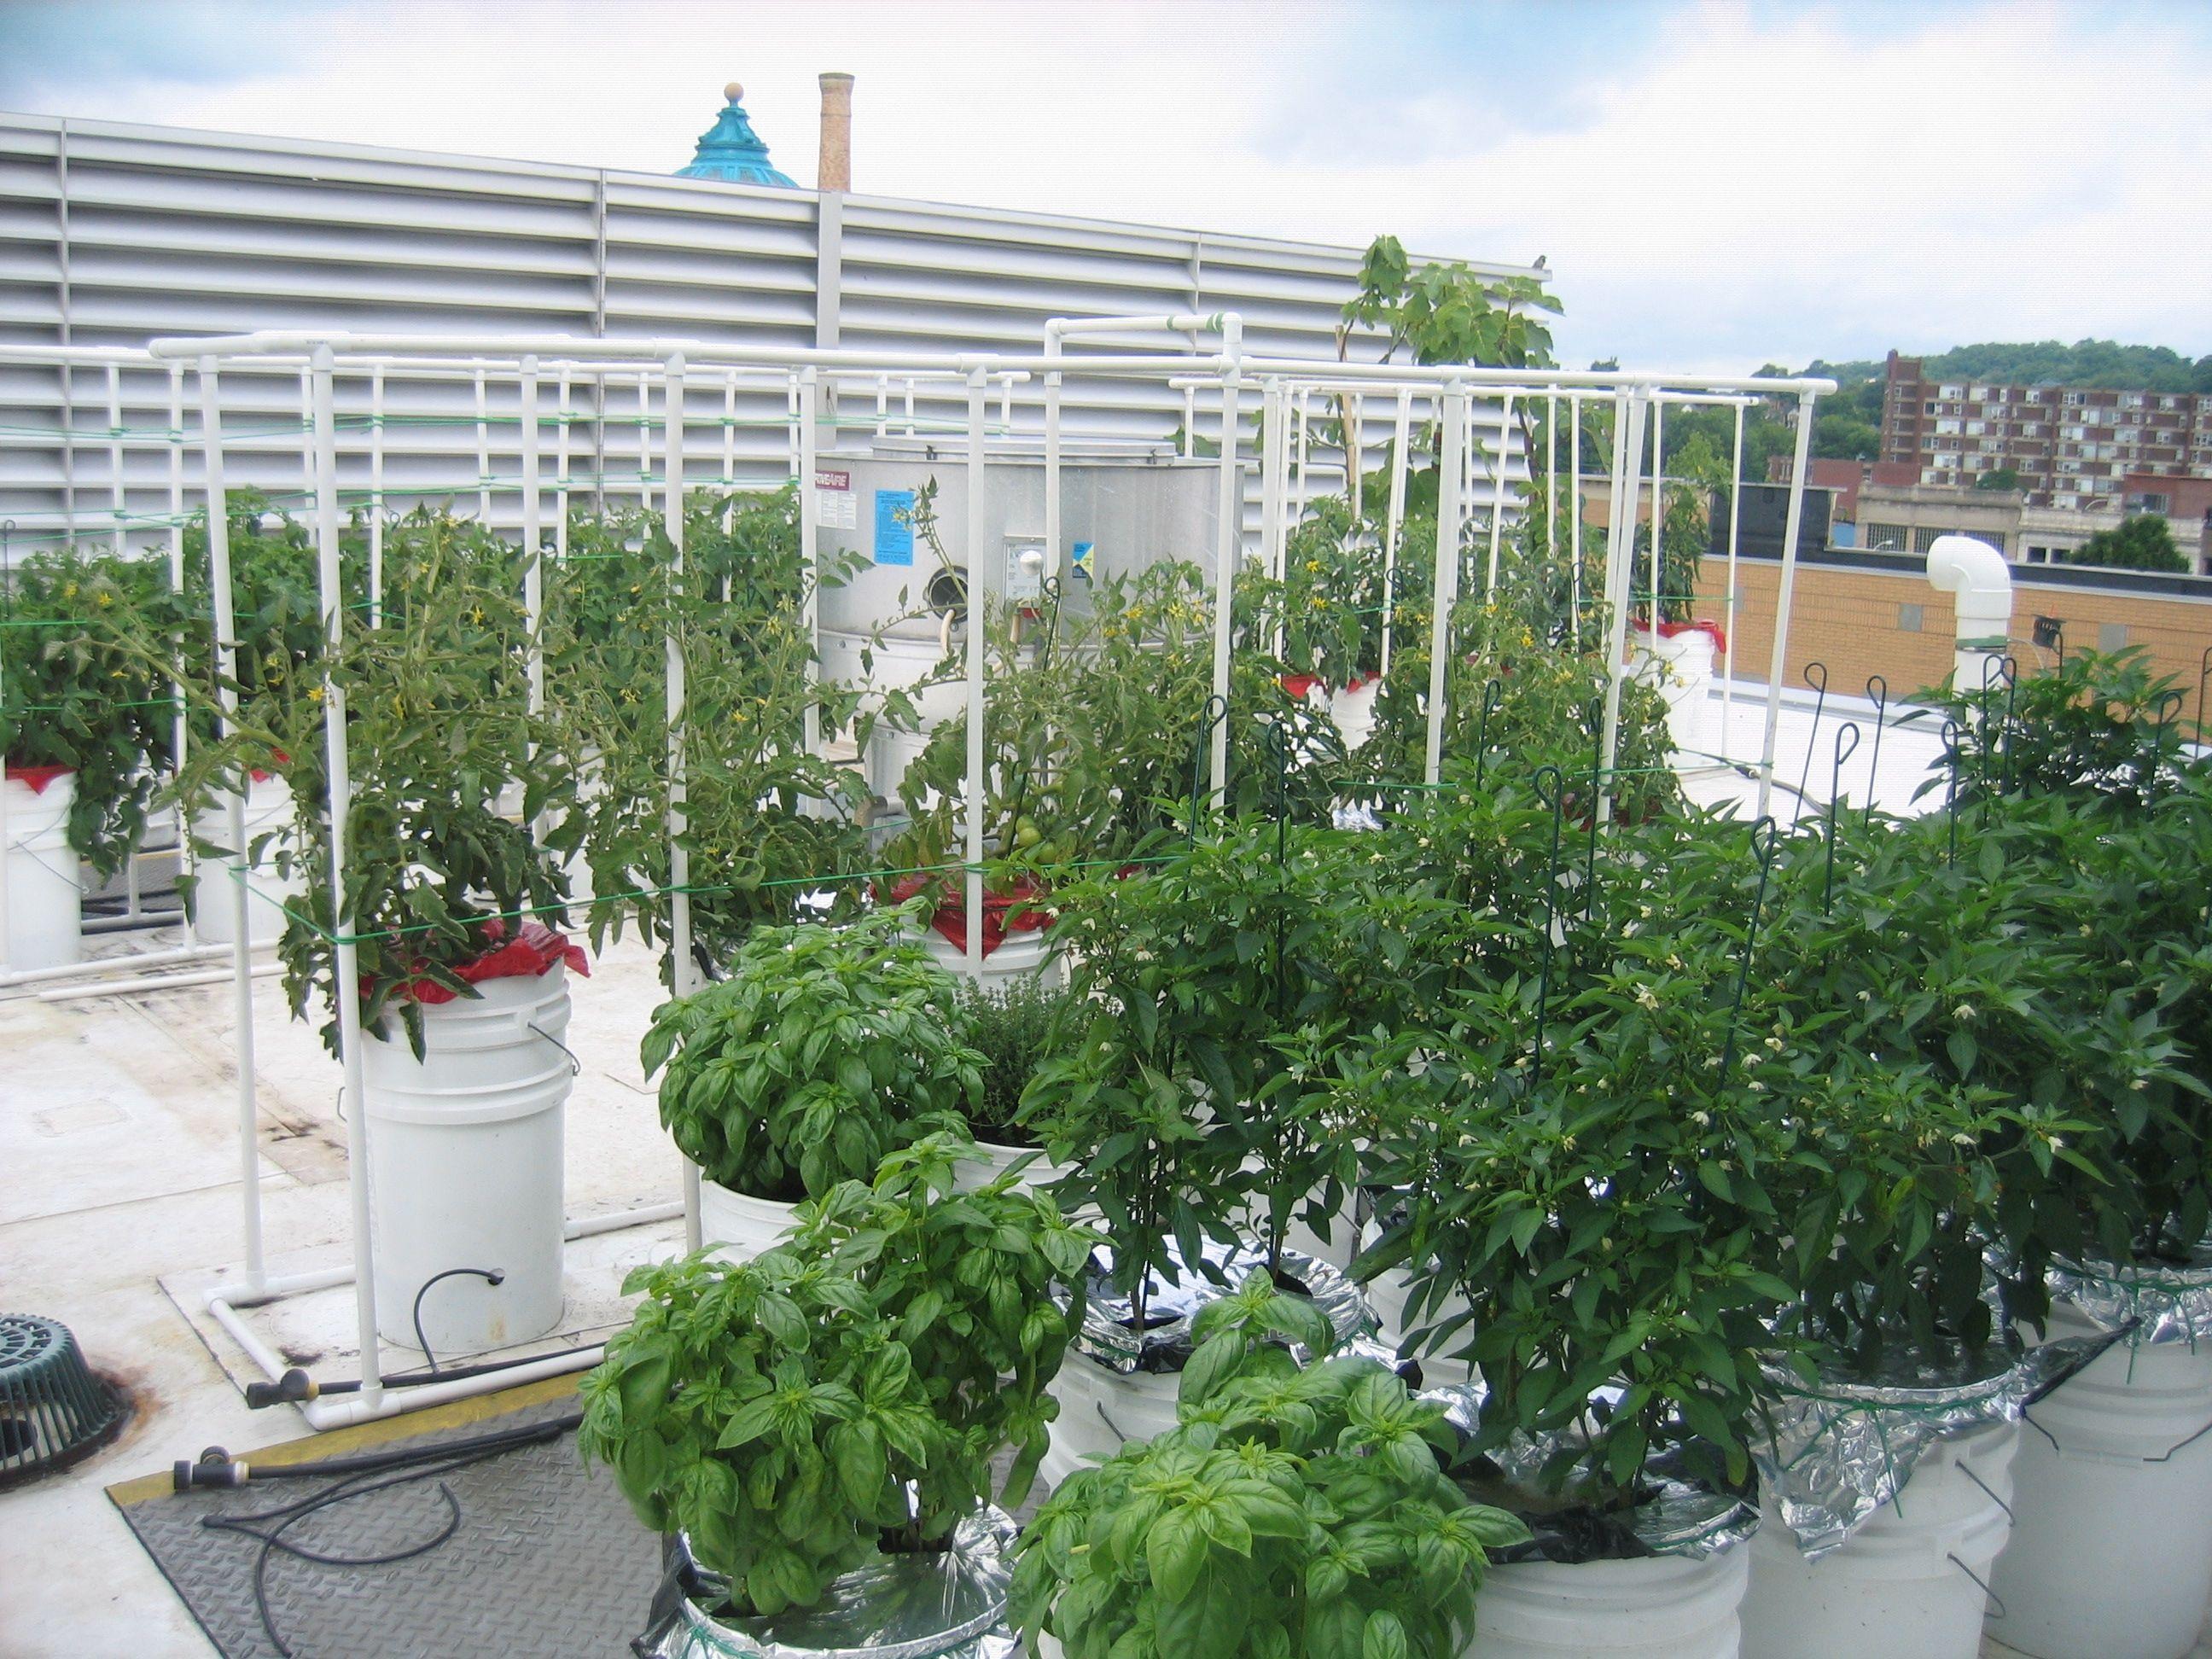 Dinette Restaurant Rooftop Garden -- 52 Containers